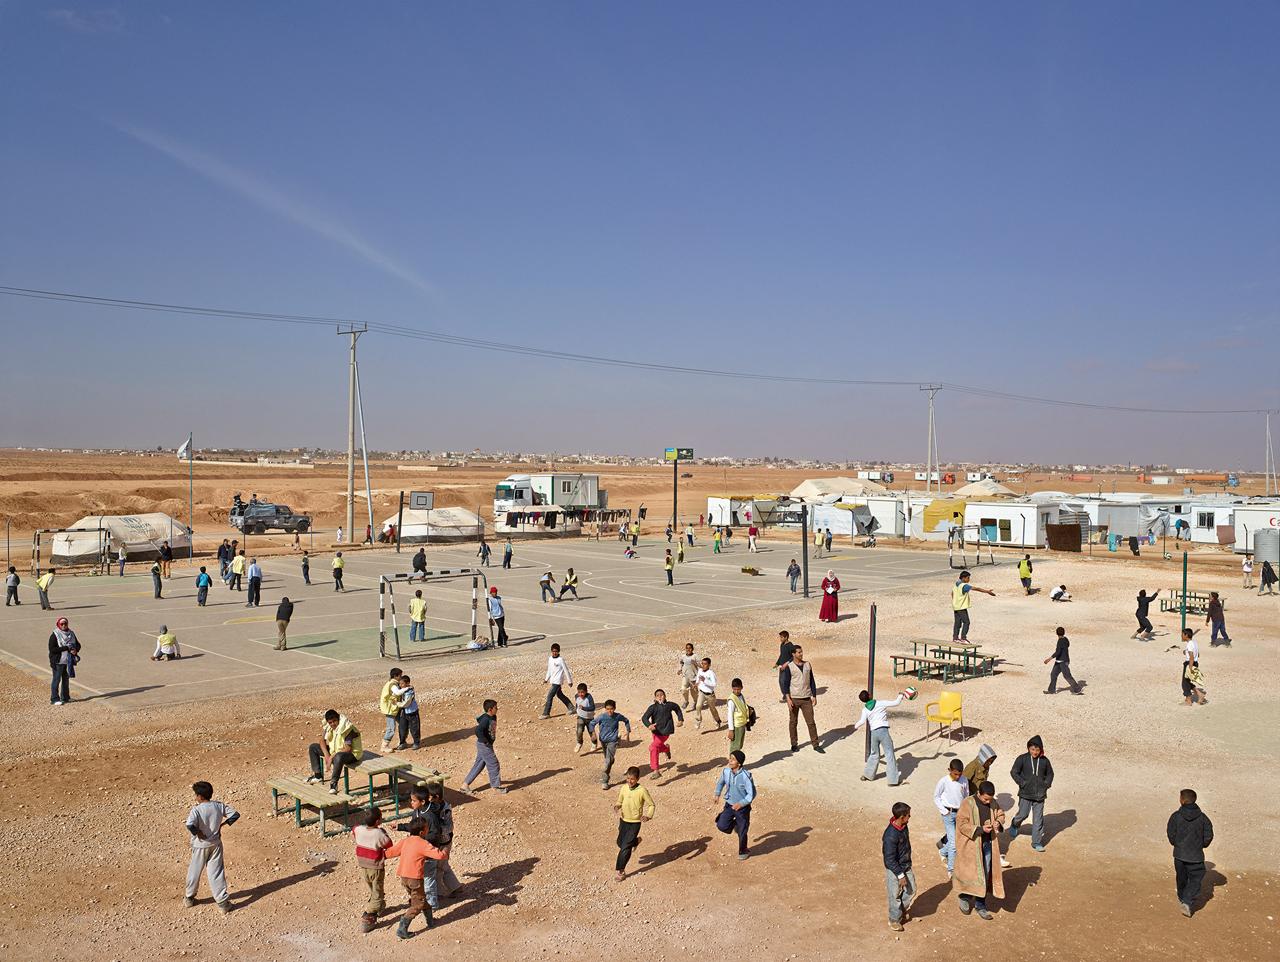 JAMES MOLLISON Adolescent Safe Space, Site 5 District 12, Zaatari Refugee Camp, Jordan, January 23, 2014